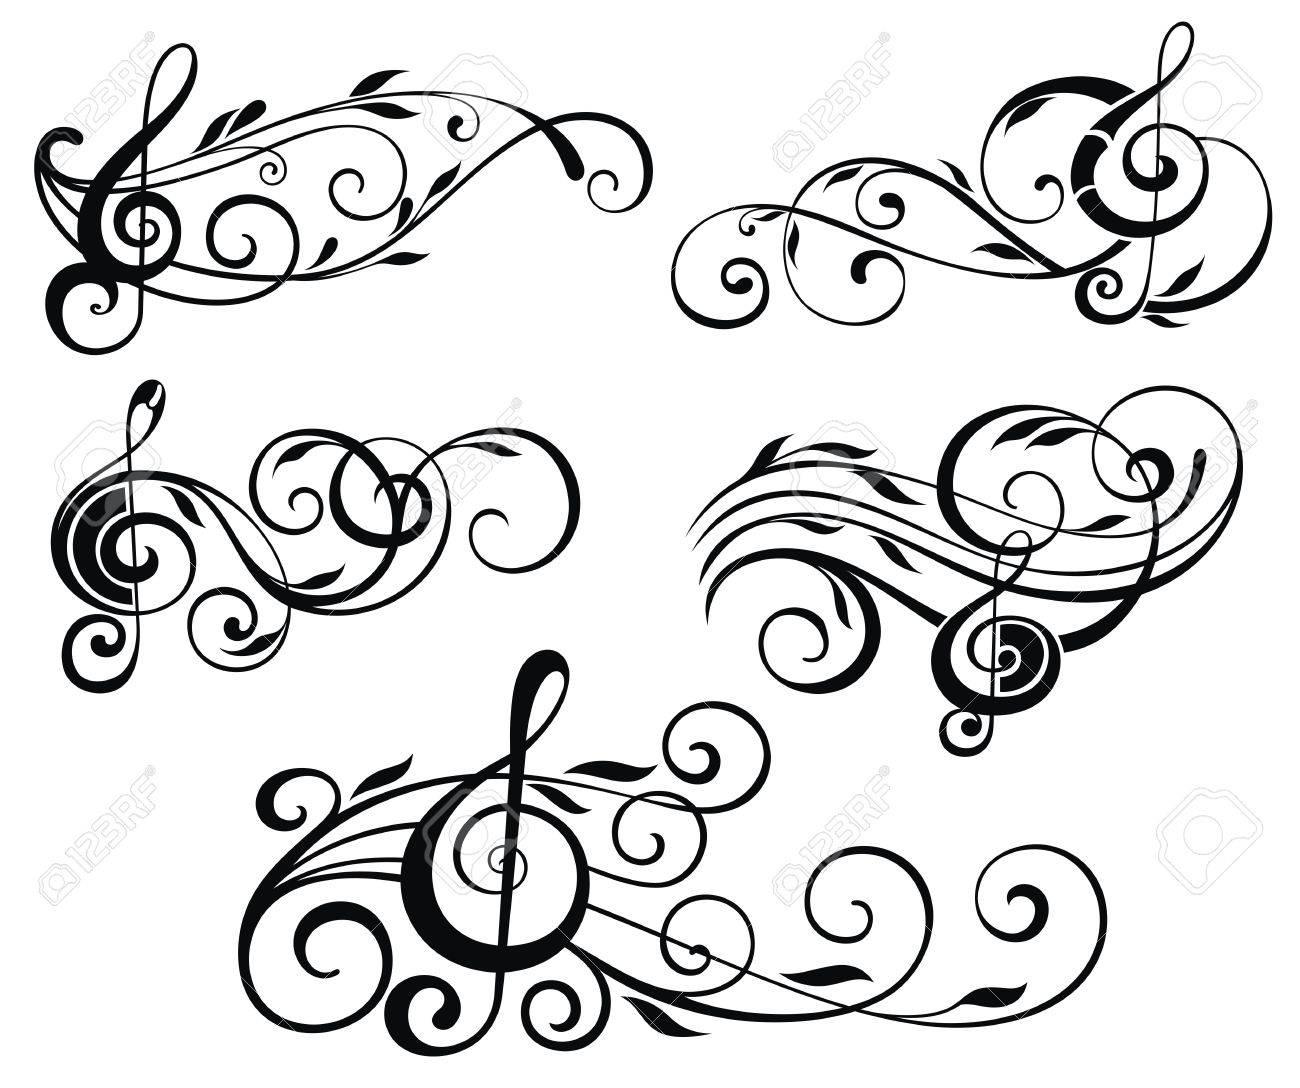 ornamental music notes with swirls on white background royalty free rh 123rf com Swirl Drawings Music Swirl